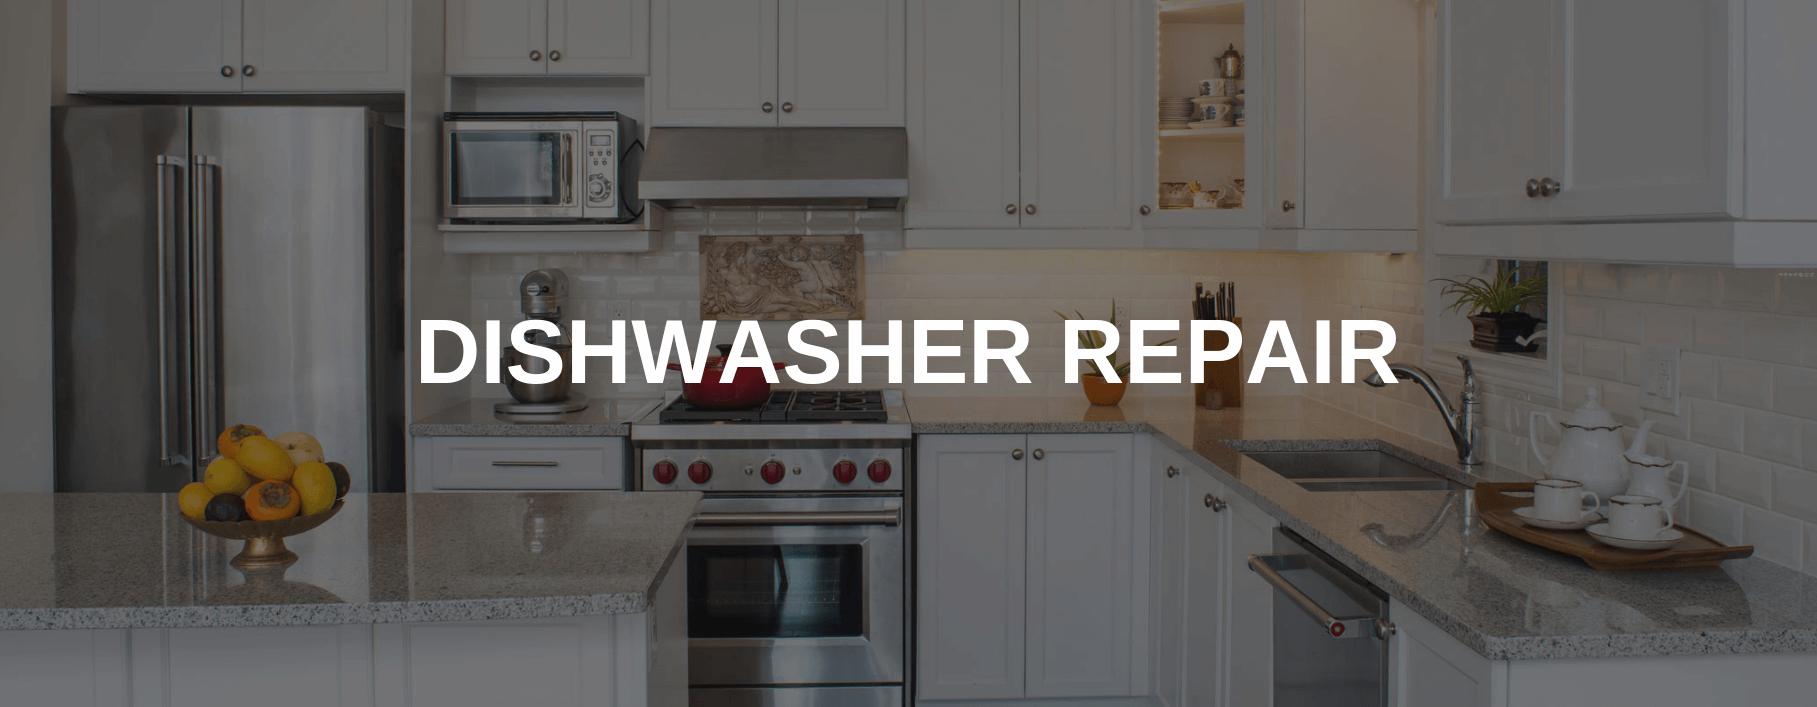 dishwasher repair meriden